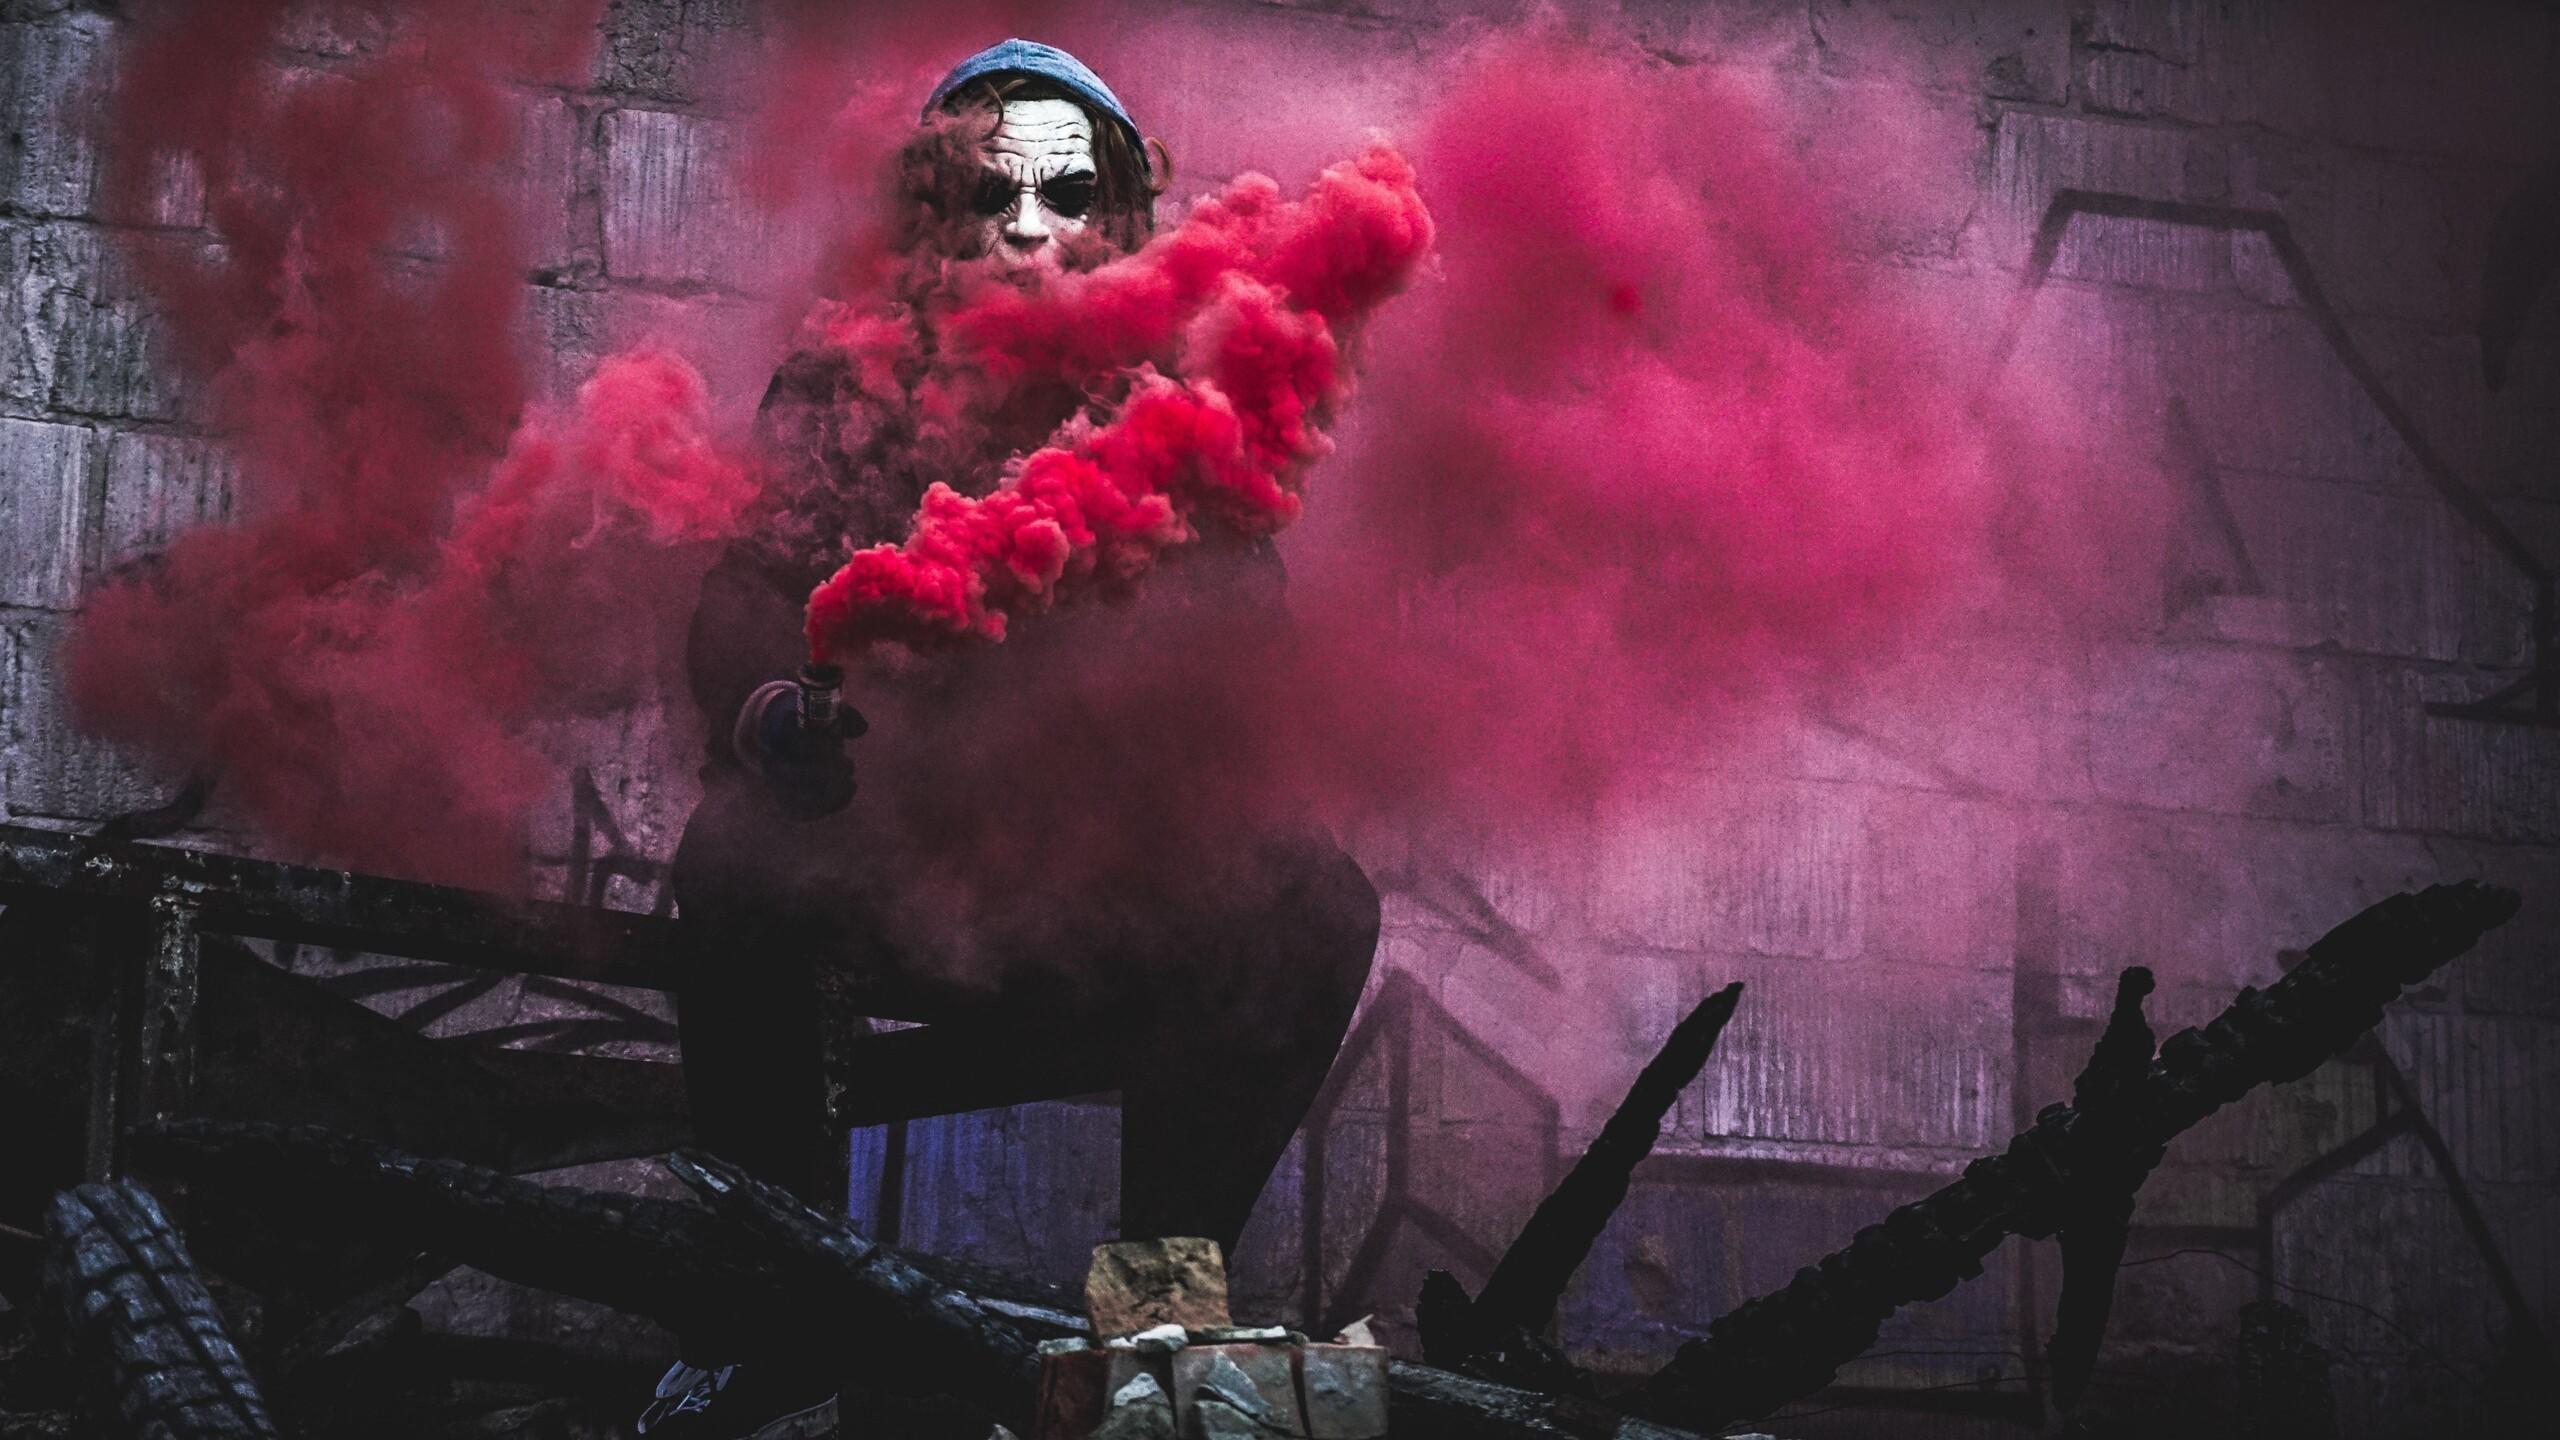 2560x1440 Red Smoke By Joker 1440P Resolution HD 4k ...